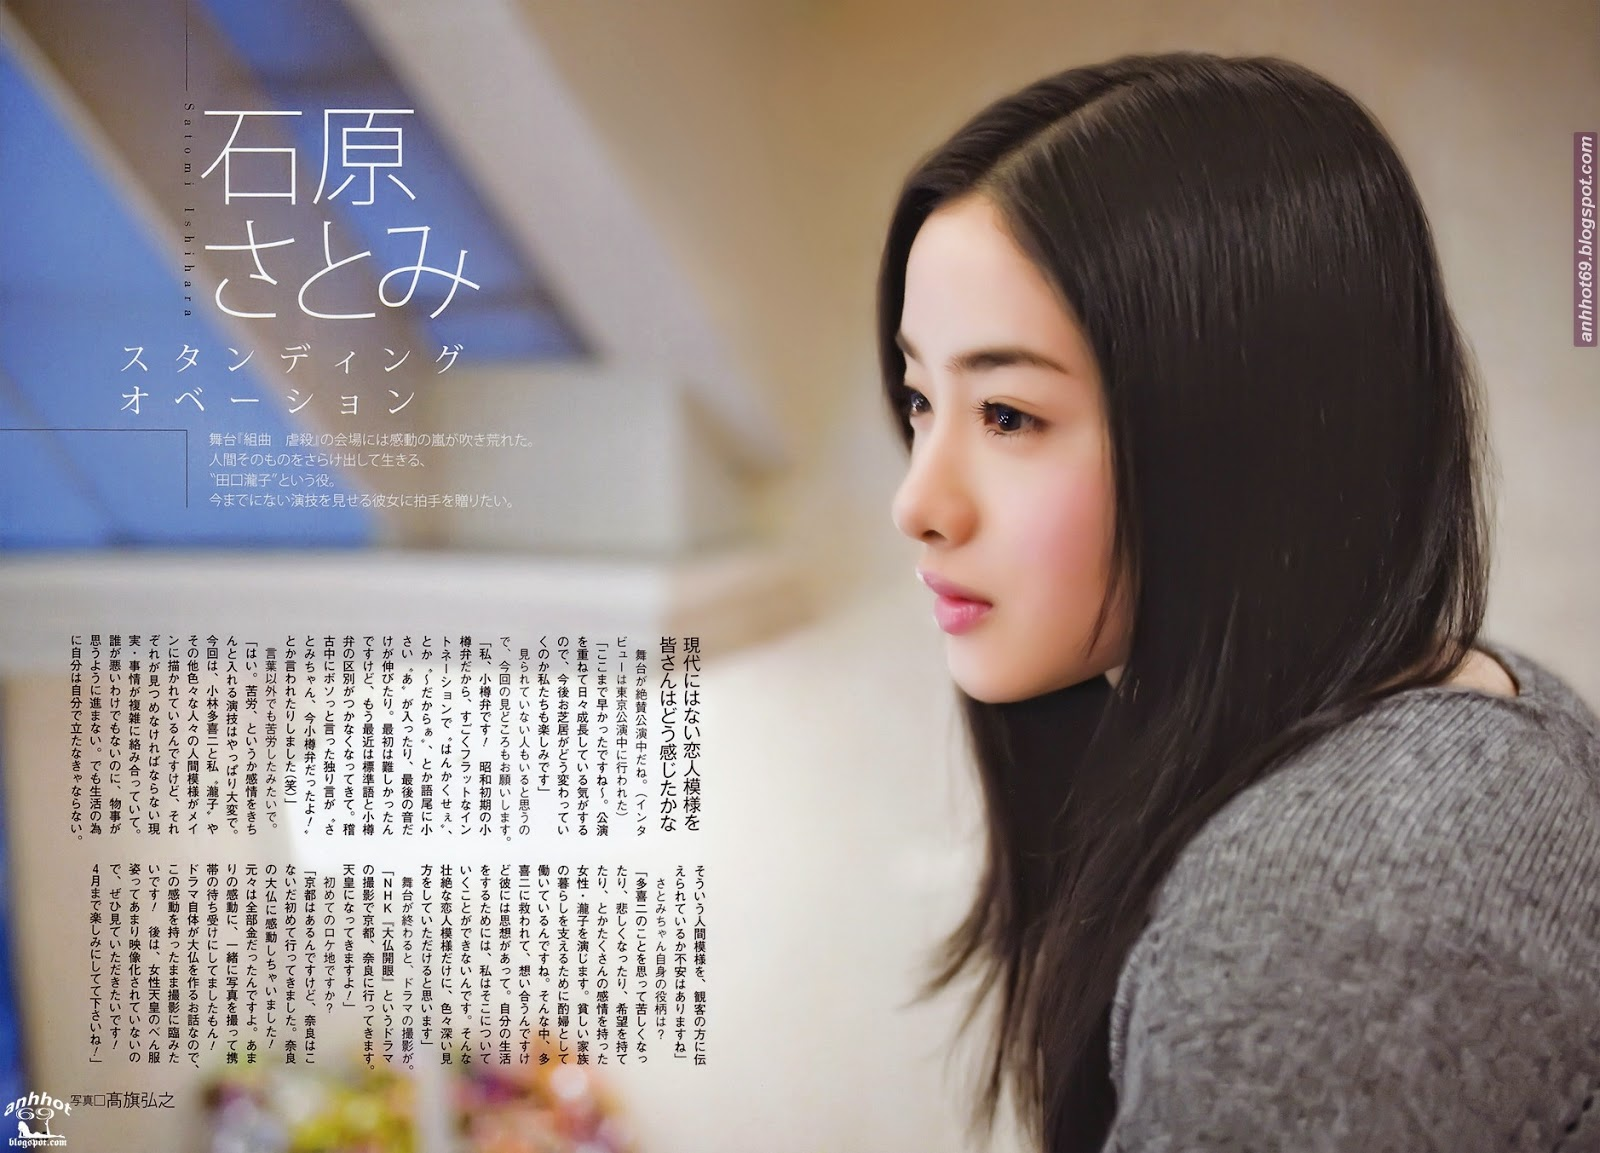 satomi-ishihara-00523518